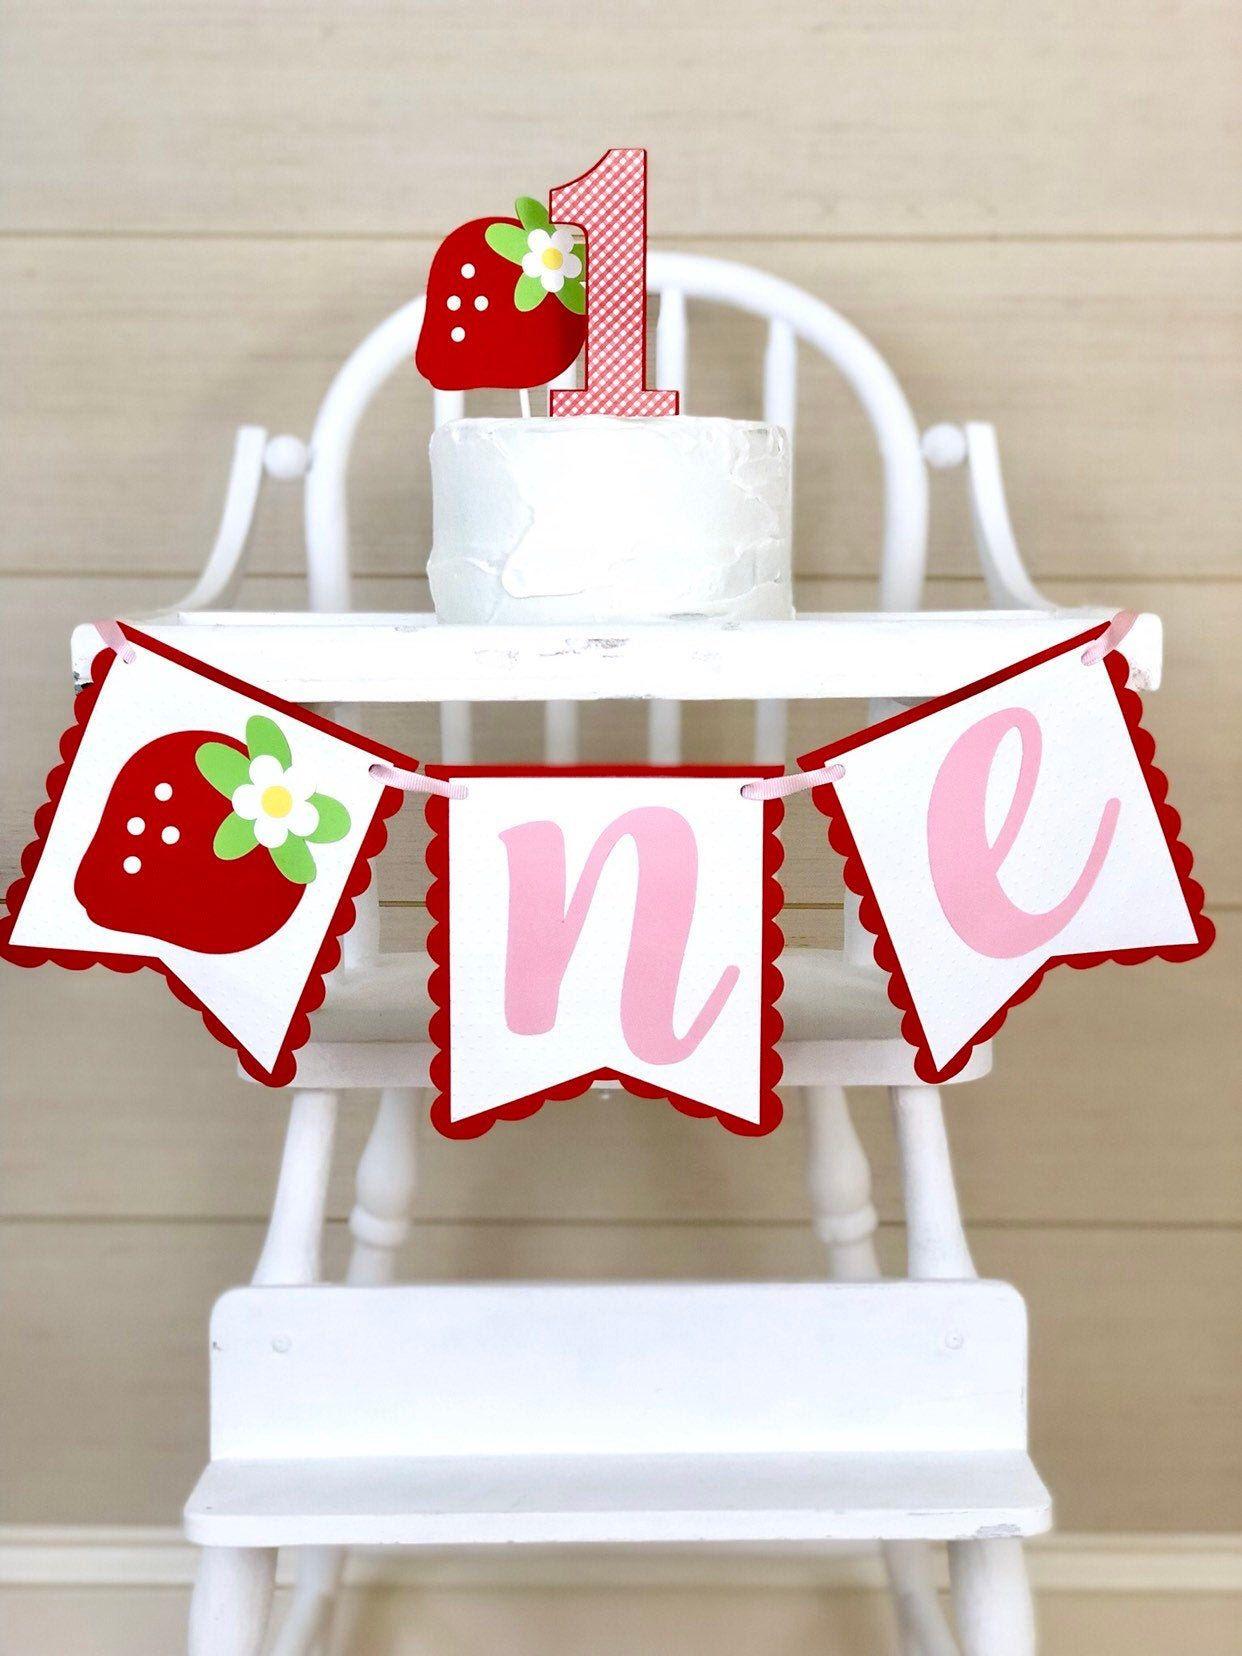 highchair banner Strawberry shortcake birthday banner smash cake photo shoot prop strawberry themed party